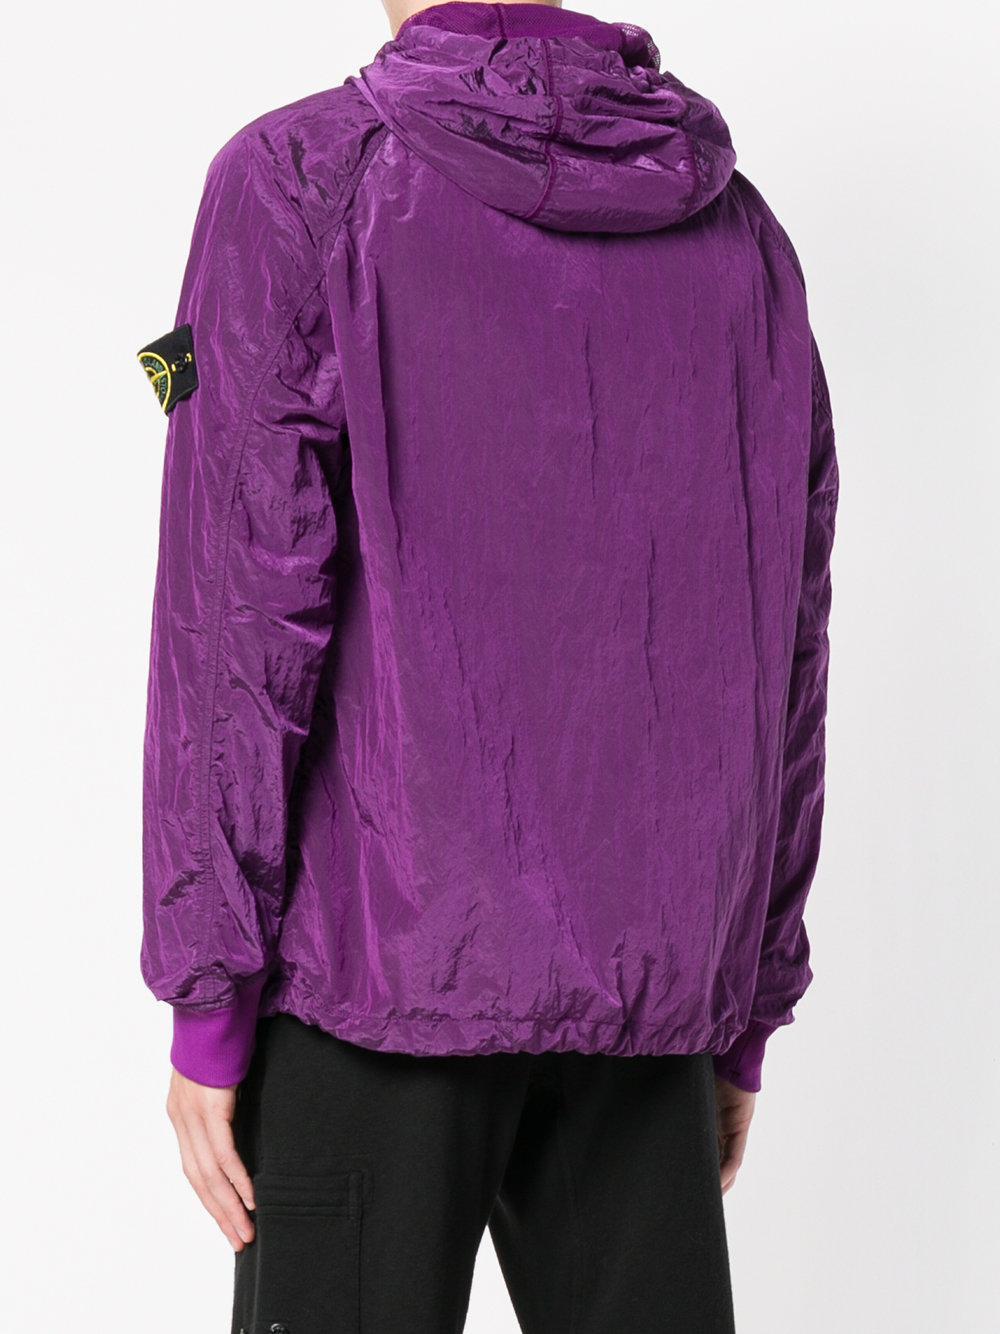 Stone Island Lightweight Drawstring Hood Jacket in Pink & Purple (Purple) for Men